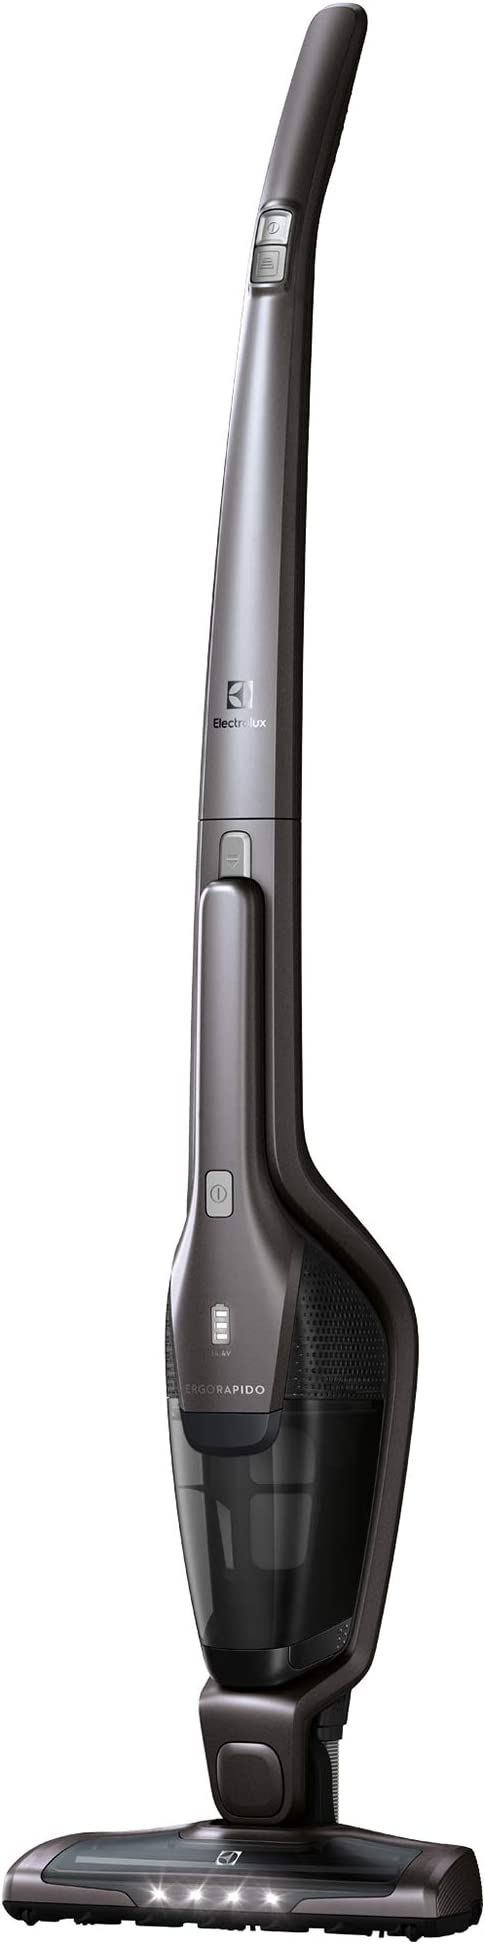 Electrolux EER73IGM Sin Bolsa 0.5L Gris, Metálico - Aspiradora ...